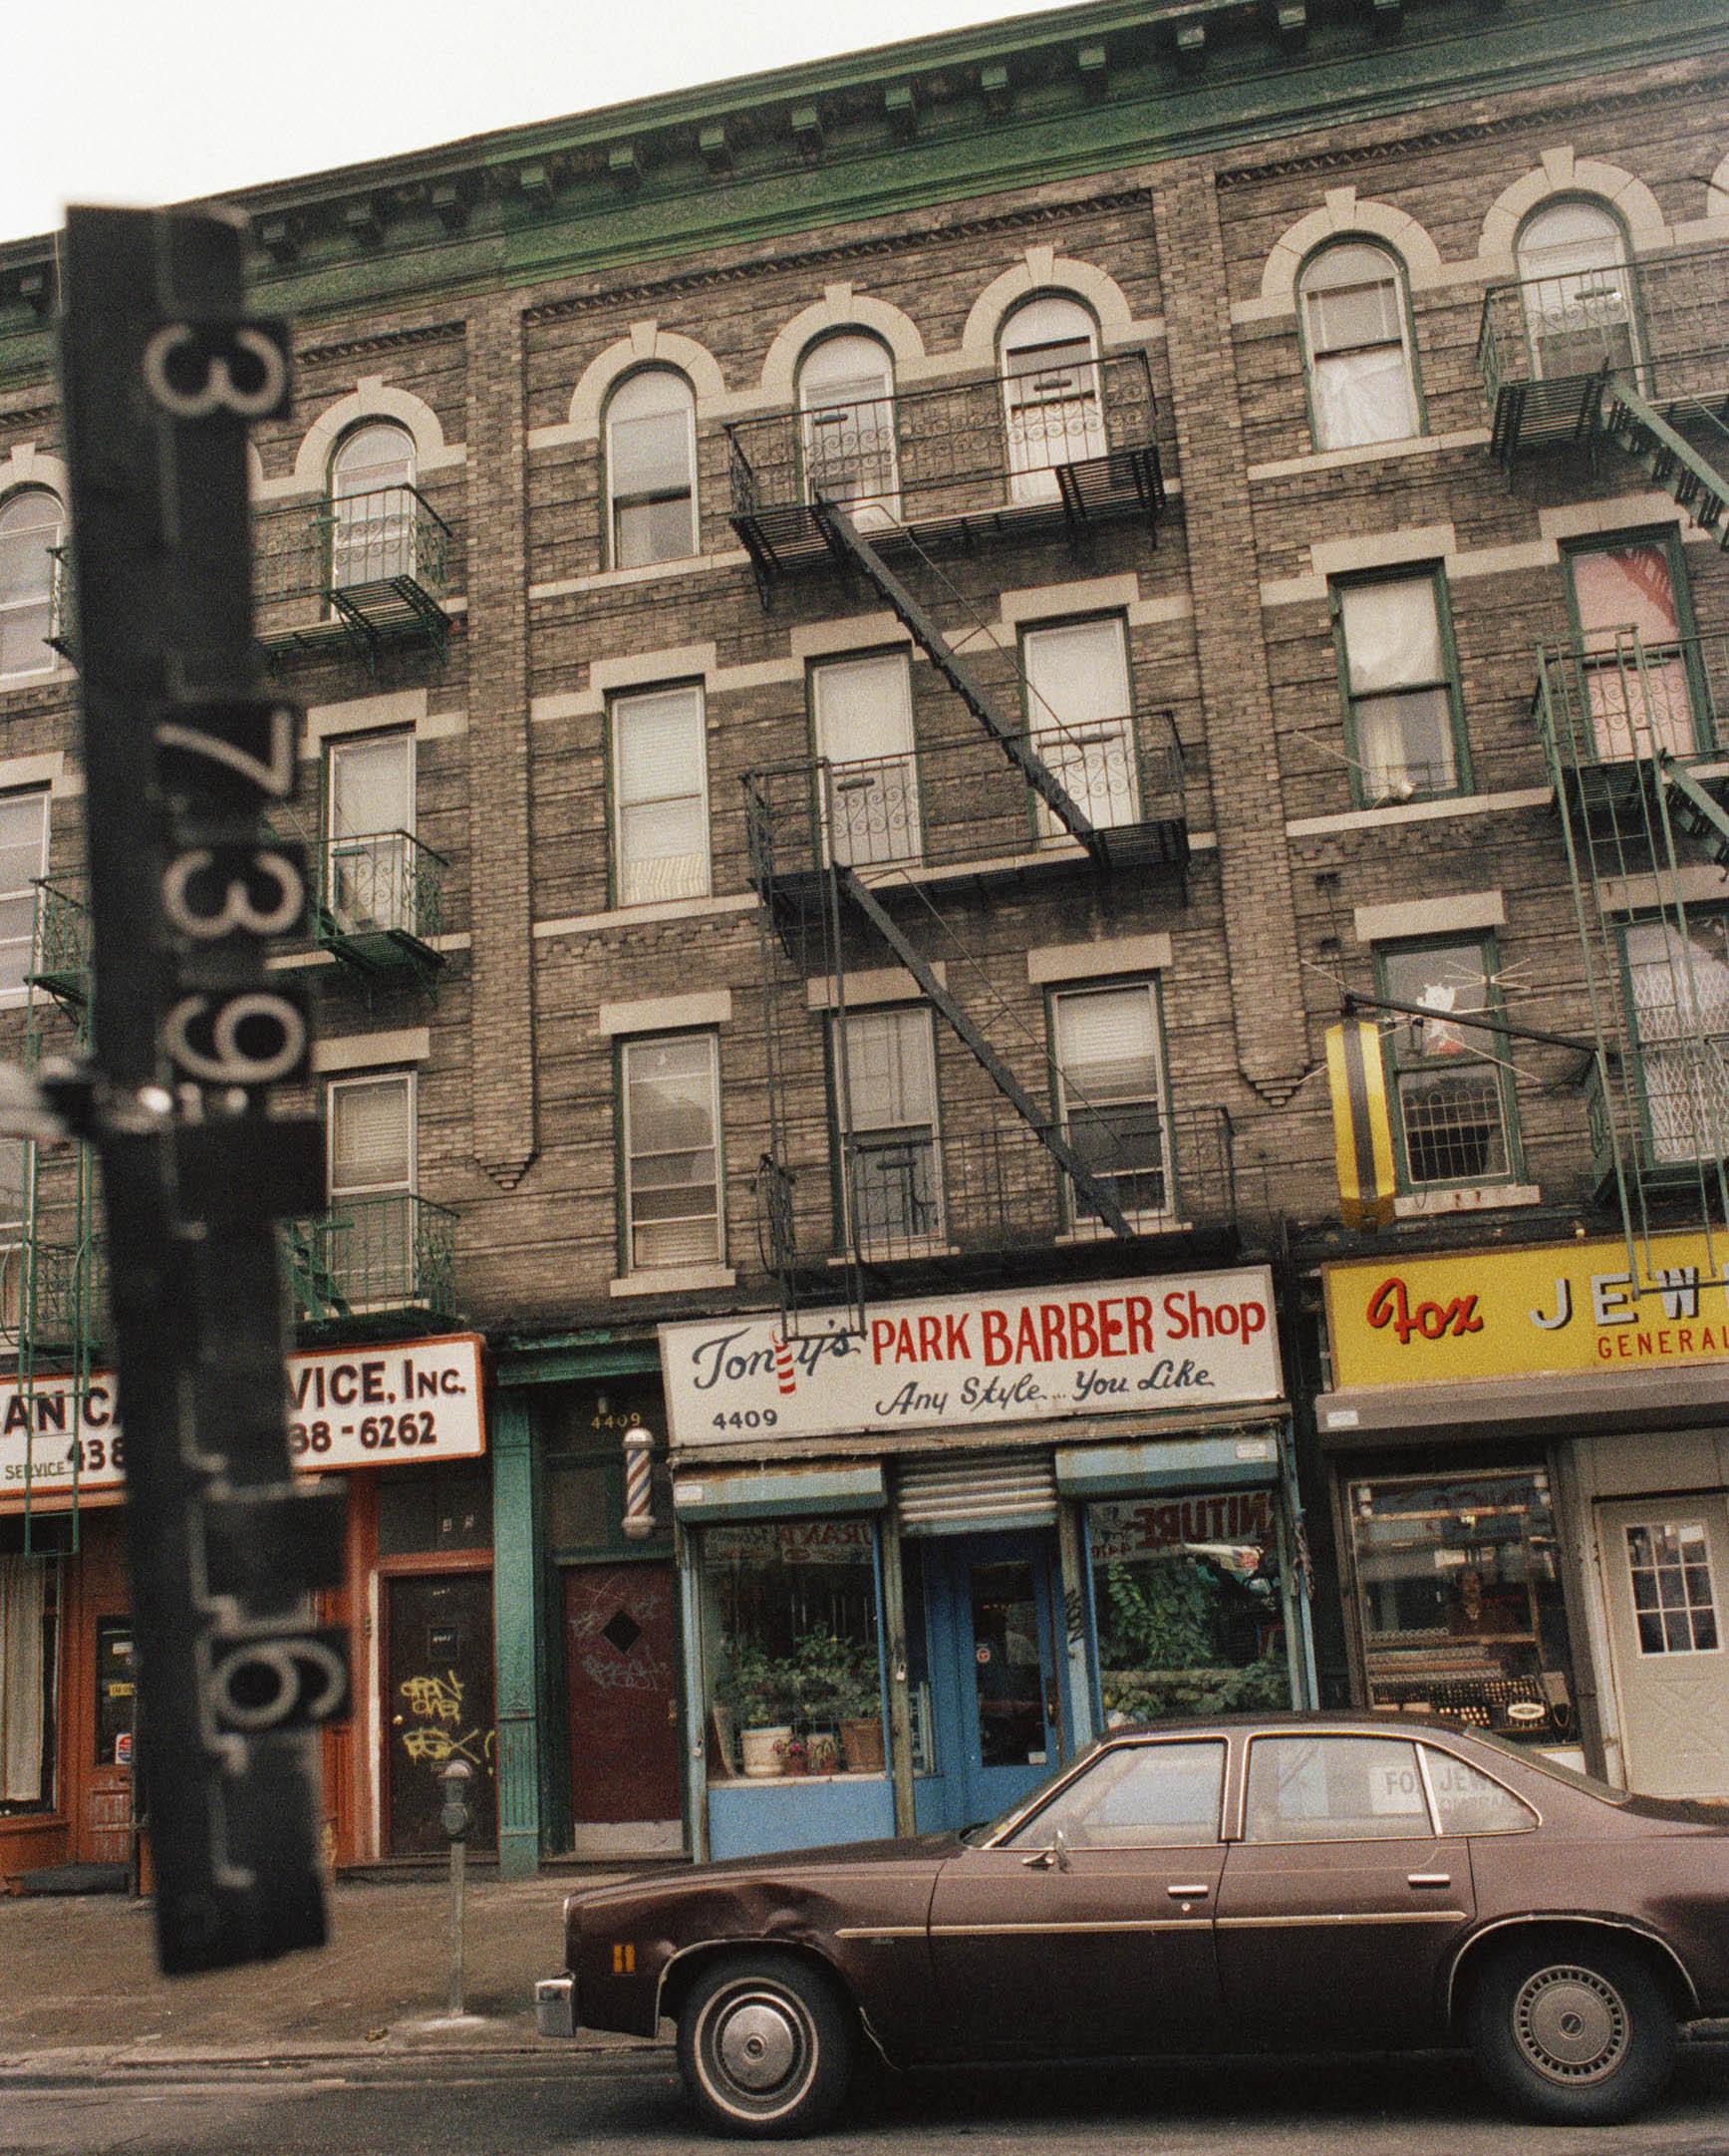 4409 5th Ave, Brooklyn, NY, mid-1980s.NYC Municipal Archives.